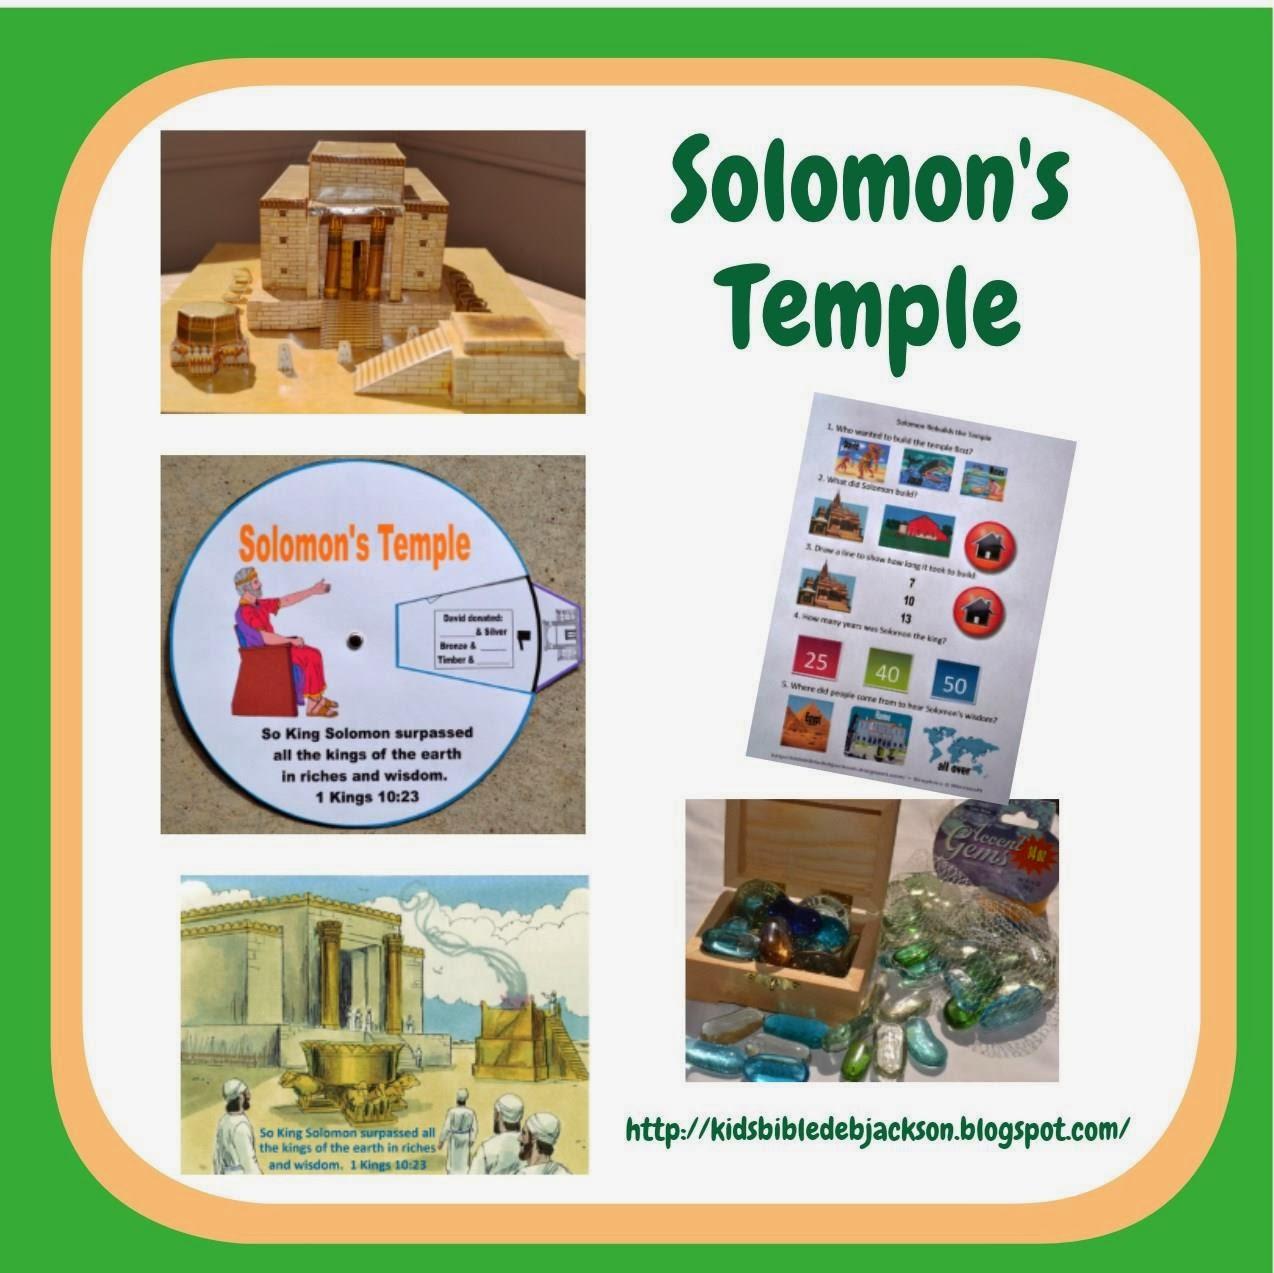 http://kidsbibledebjackson.blogspot.com/2014/02/solomon-rebuilds-temple.html